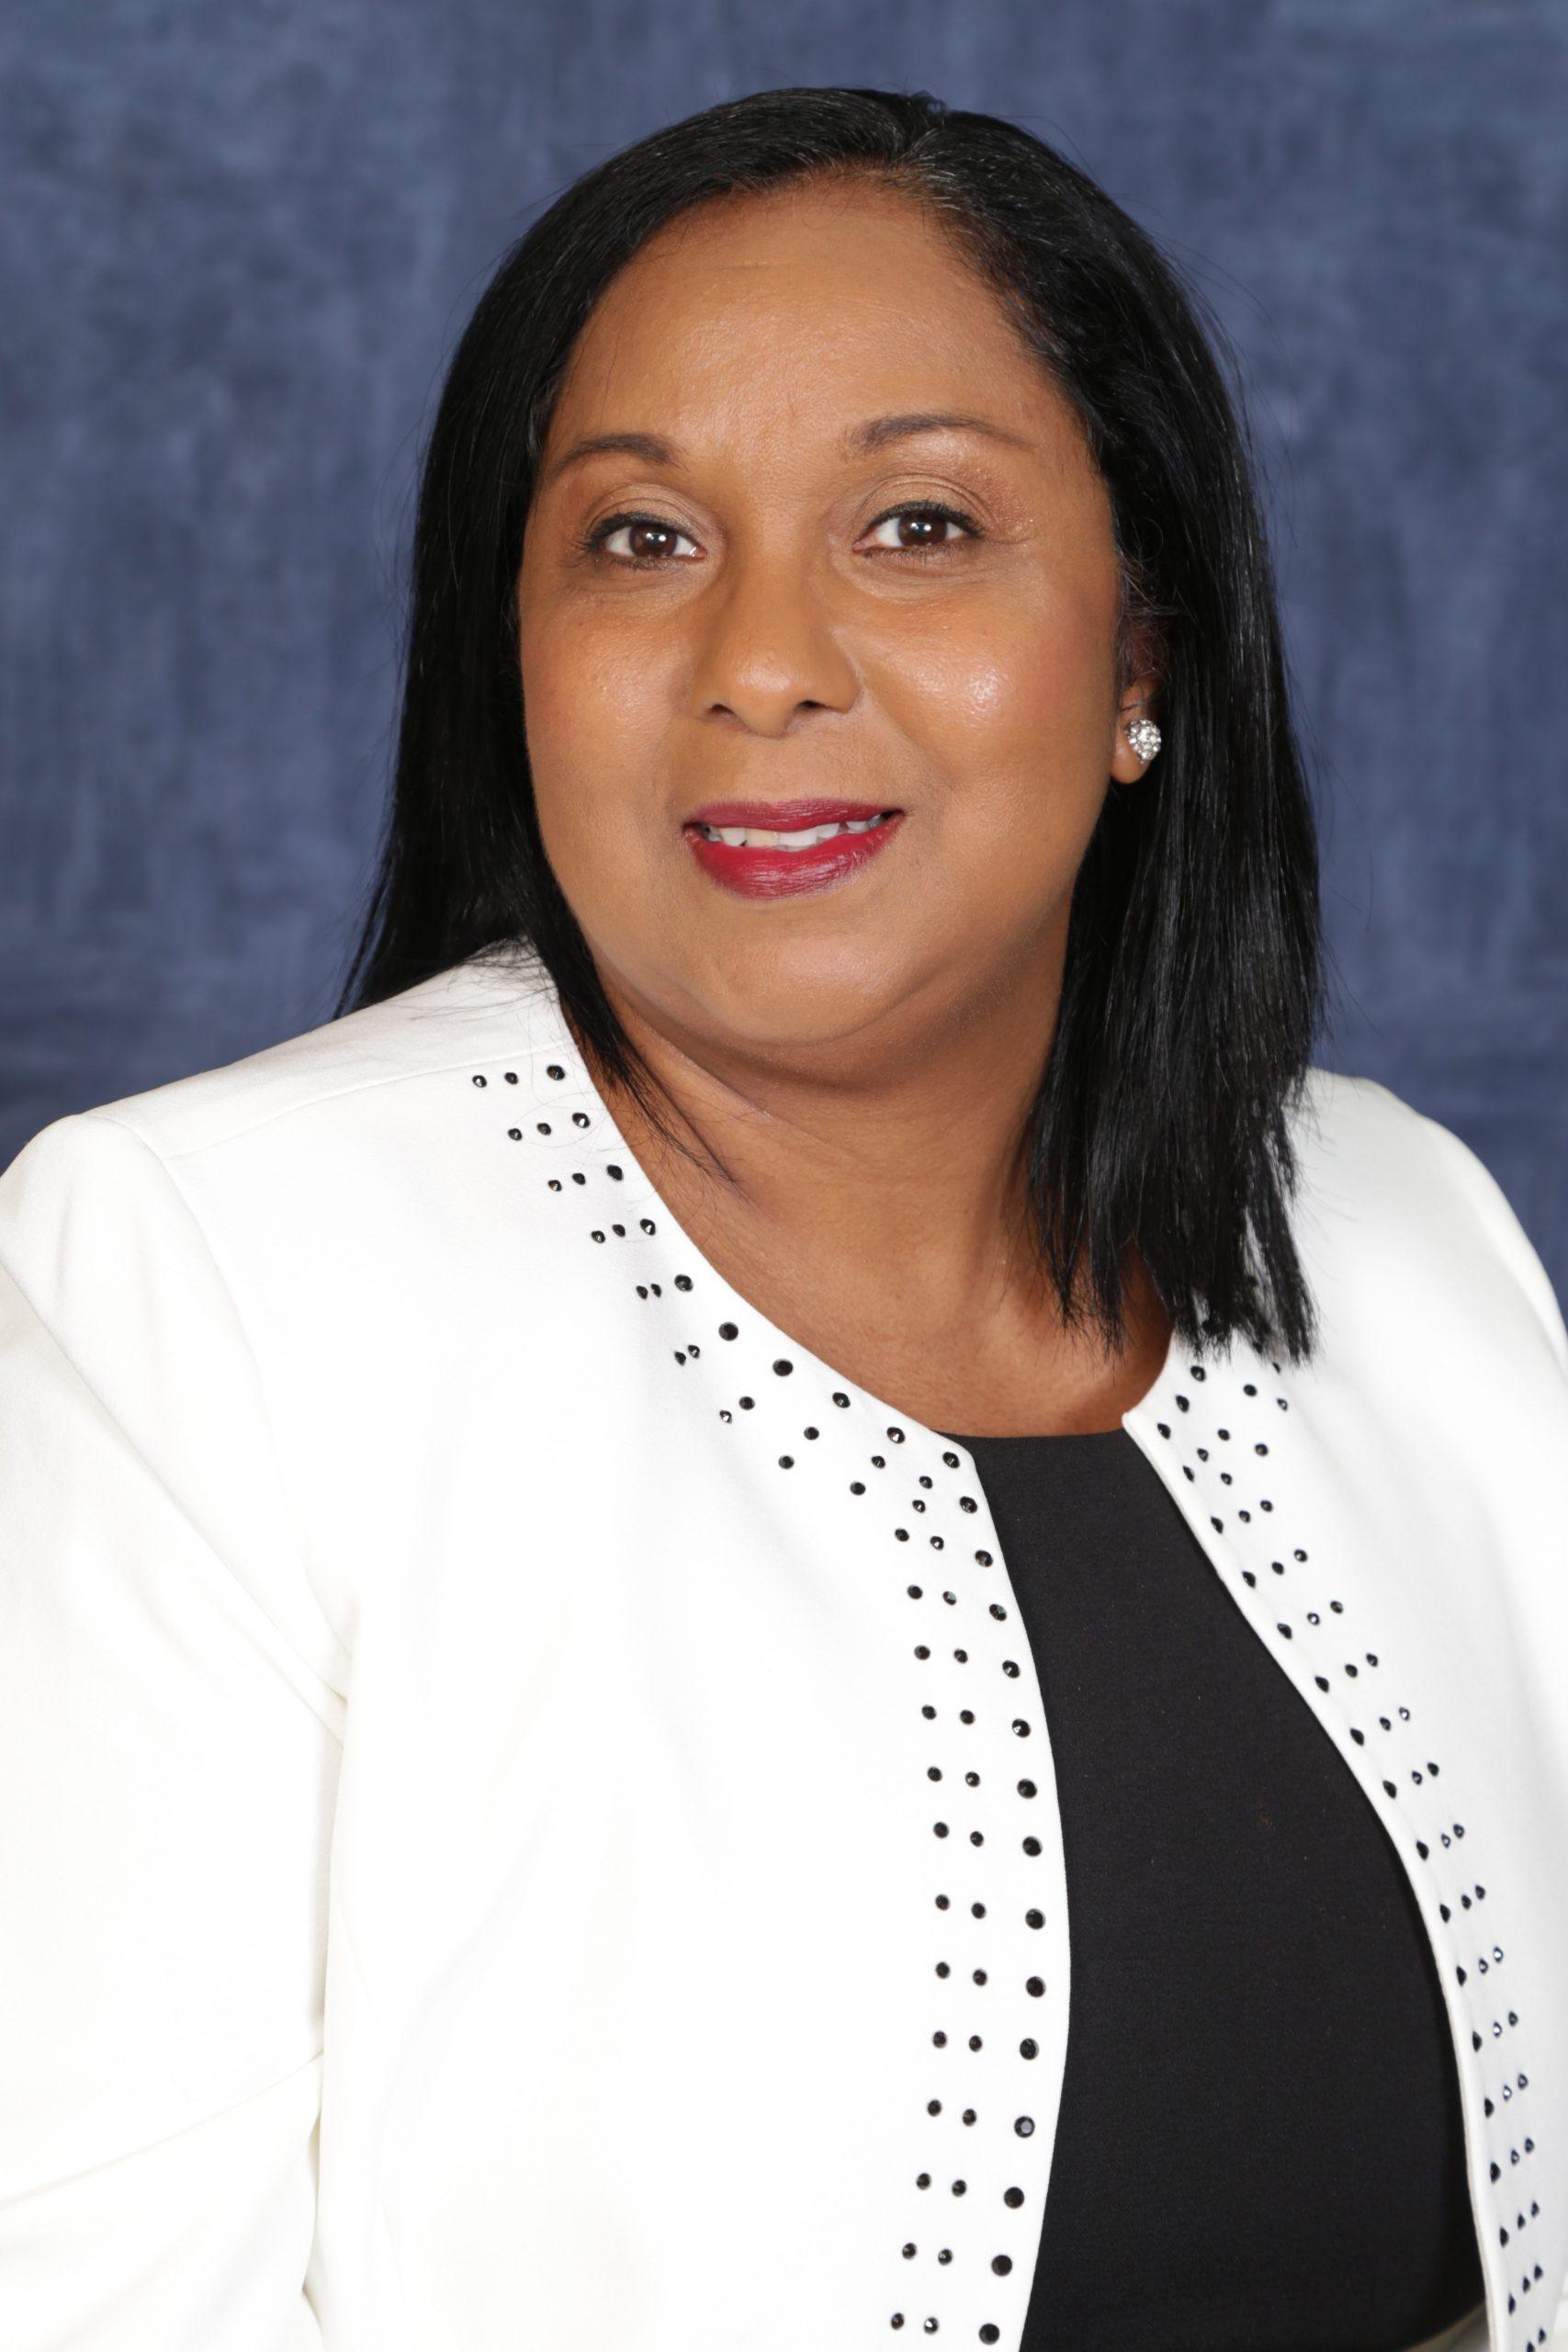 Teresa Wankin, CANTO Secretary General